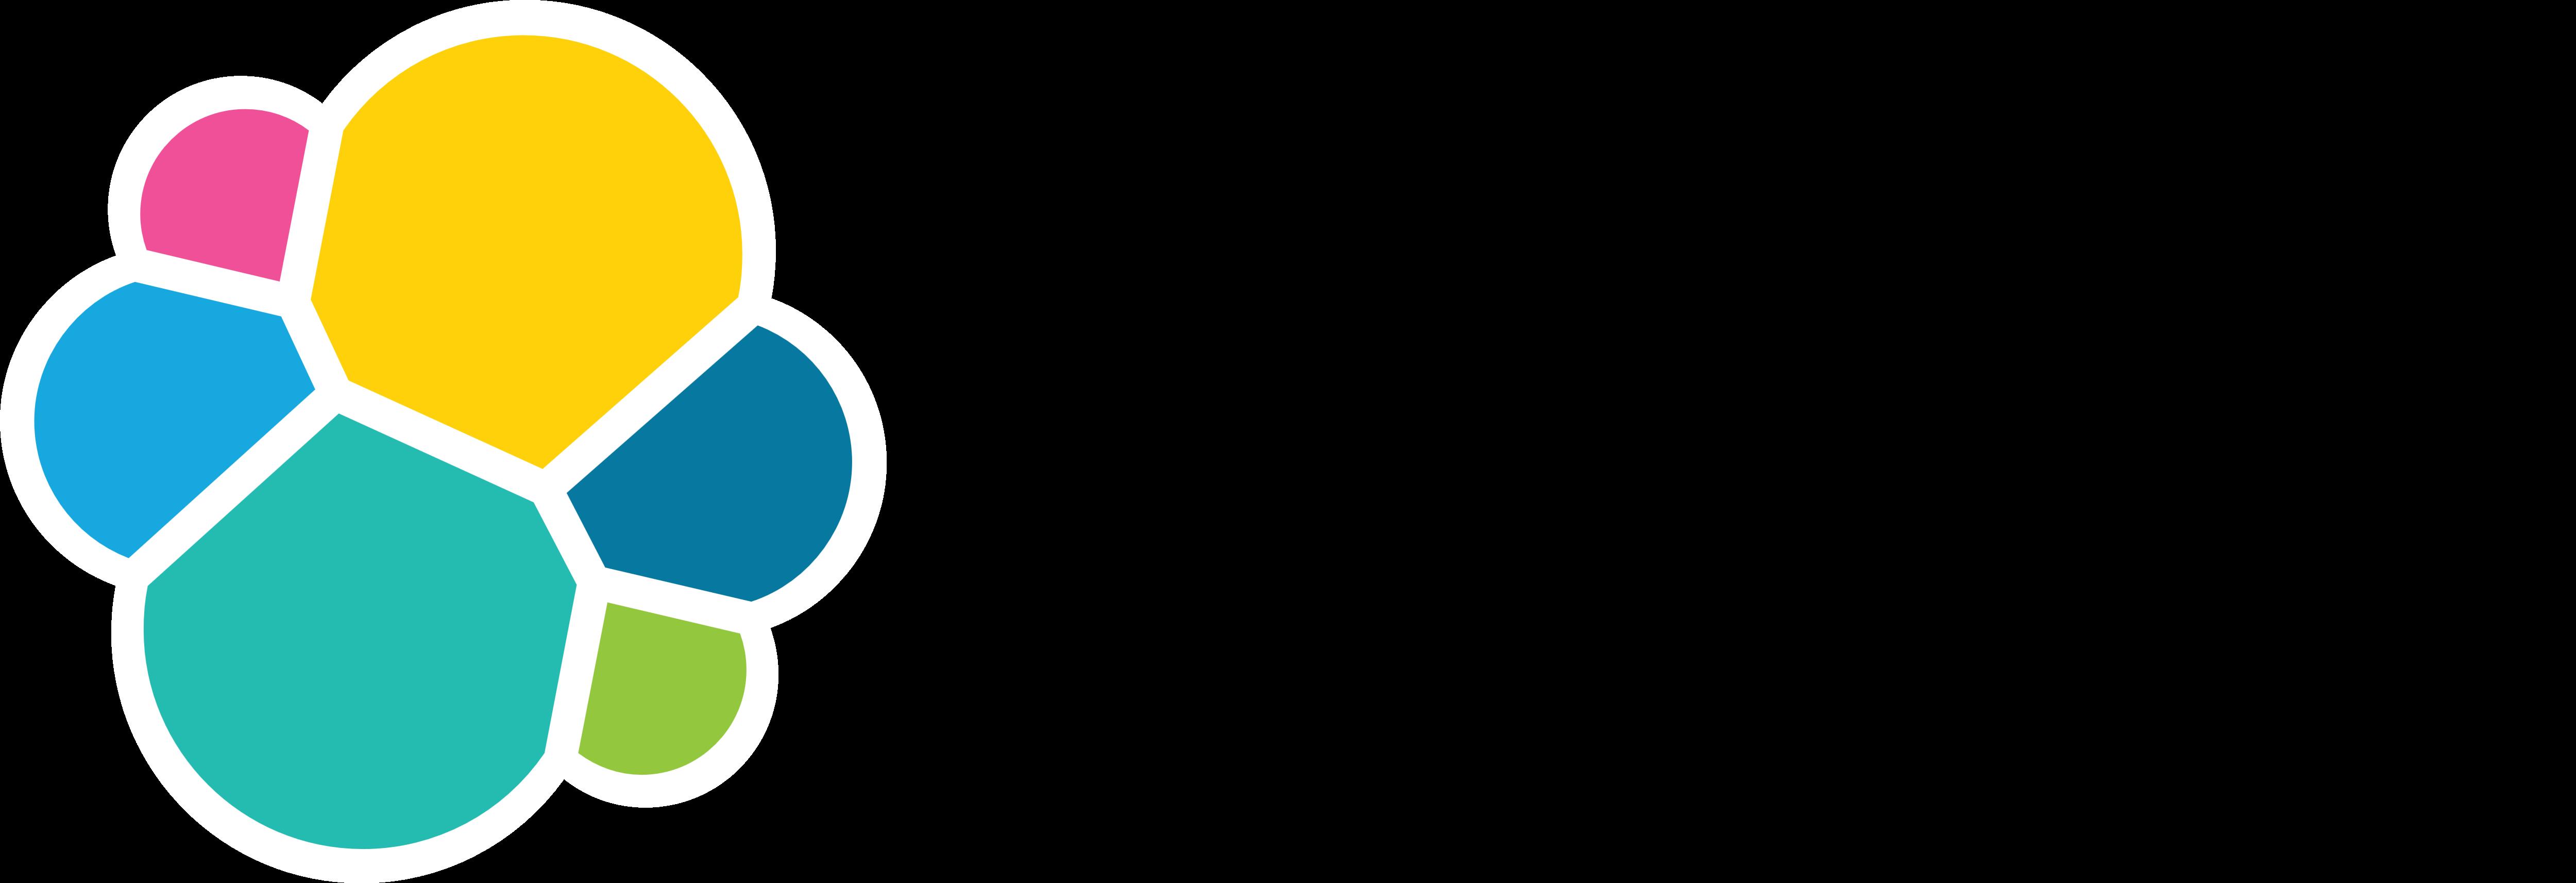 Elastic_logo